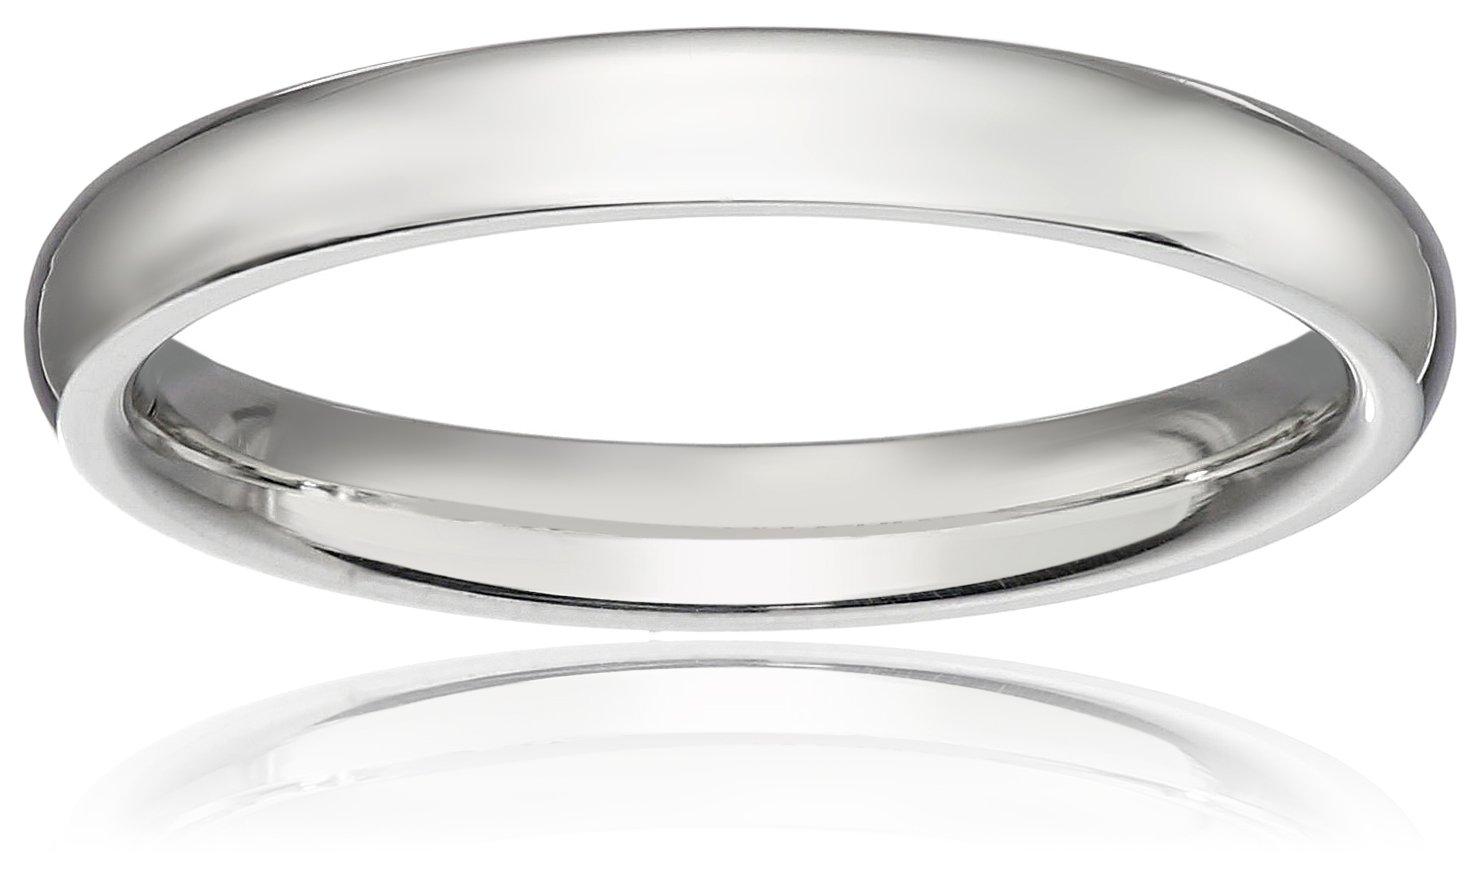 Standard Comfort-Fit Platinum Band, 3mm, Size 6.5